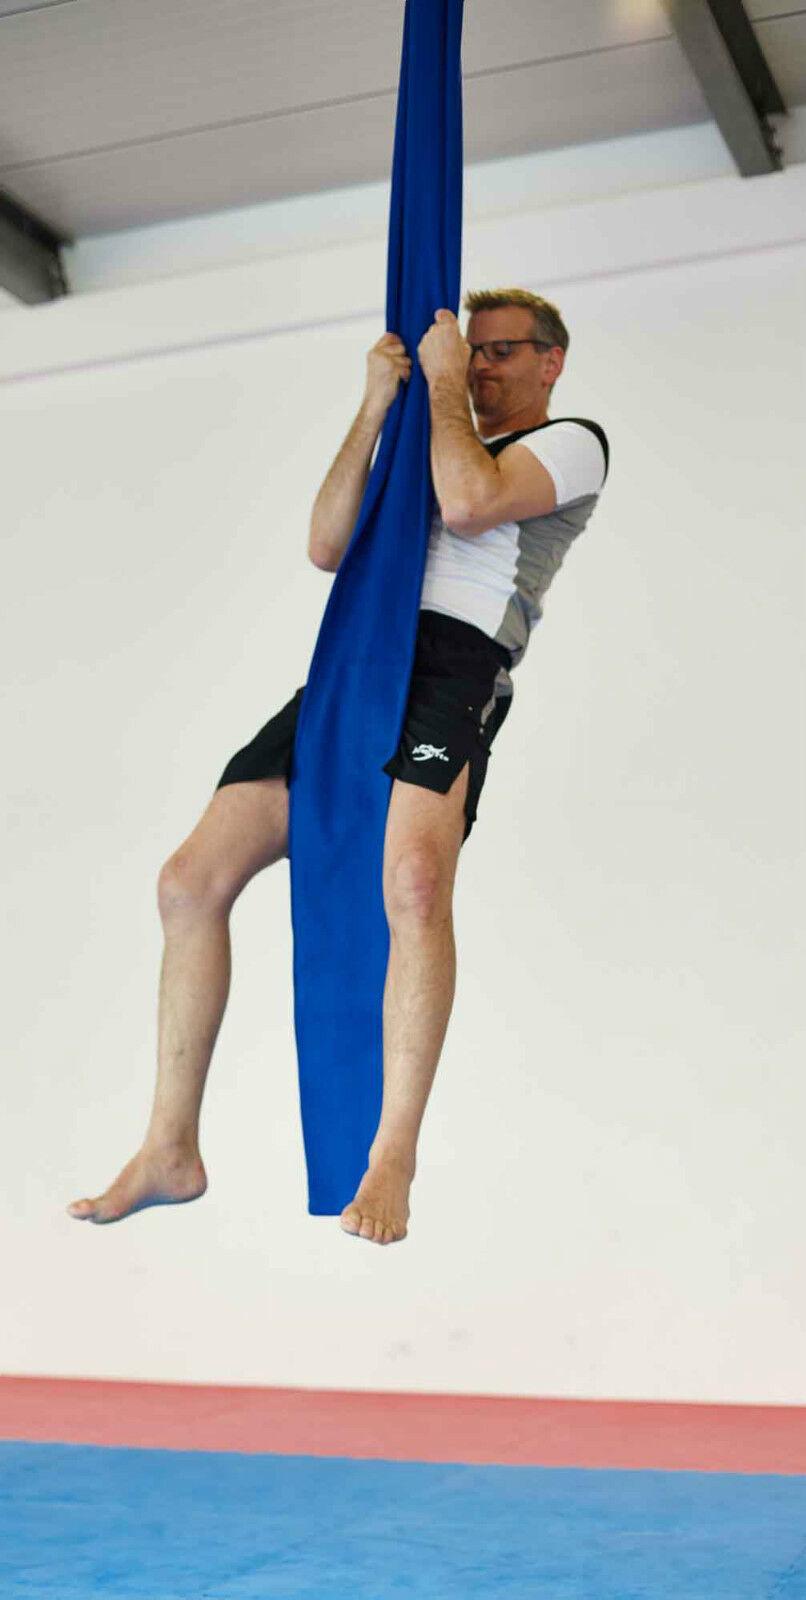 Ju-Sports- Kumi Kata Tube Tube Tube - Kletterseil aus Gi-Stoff 170cm. Krafttraining. Judo. 28330f